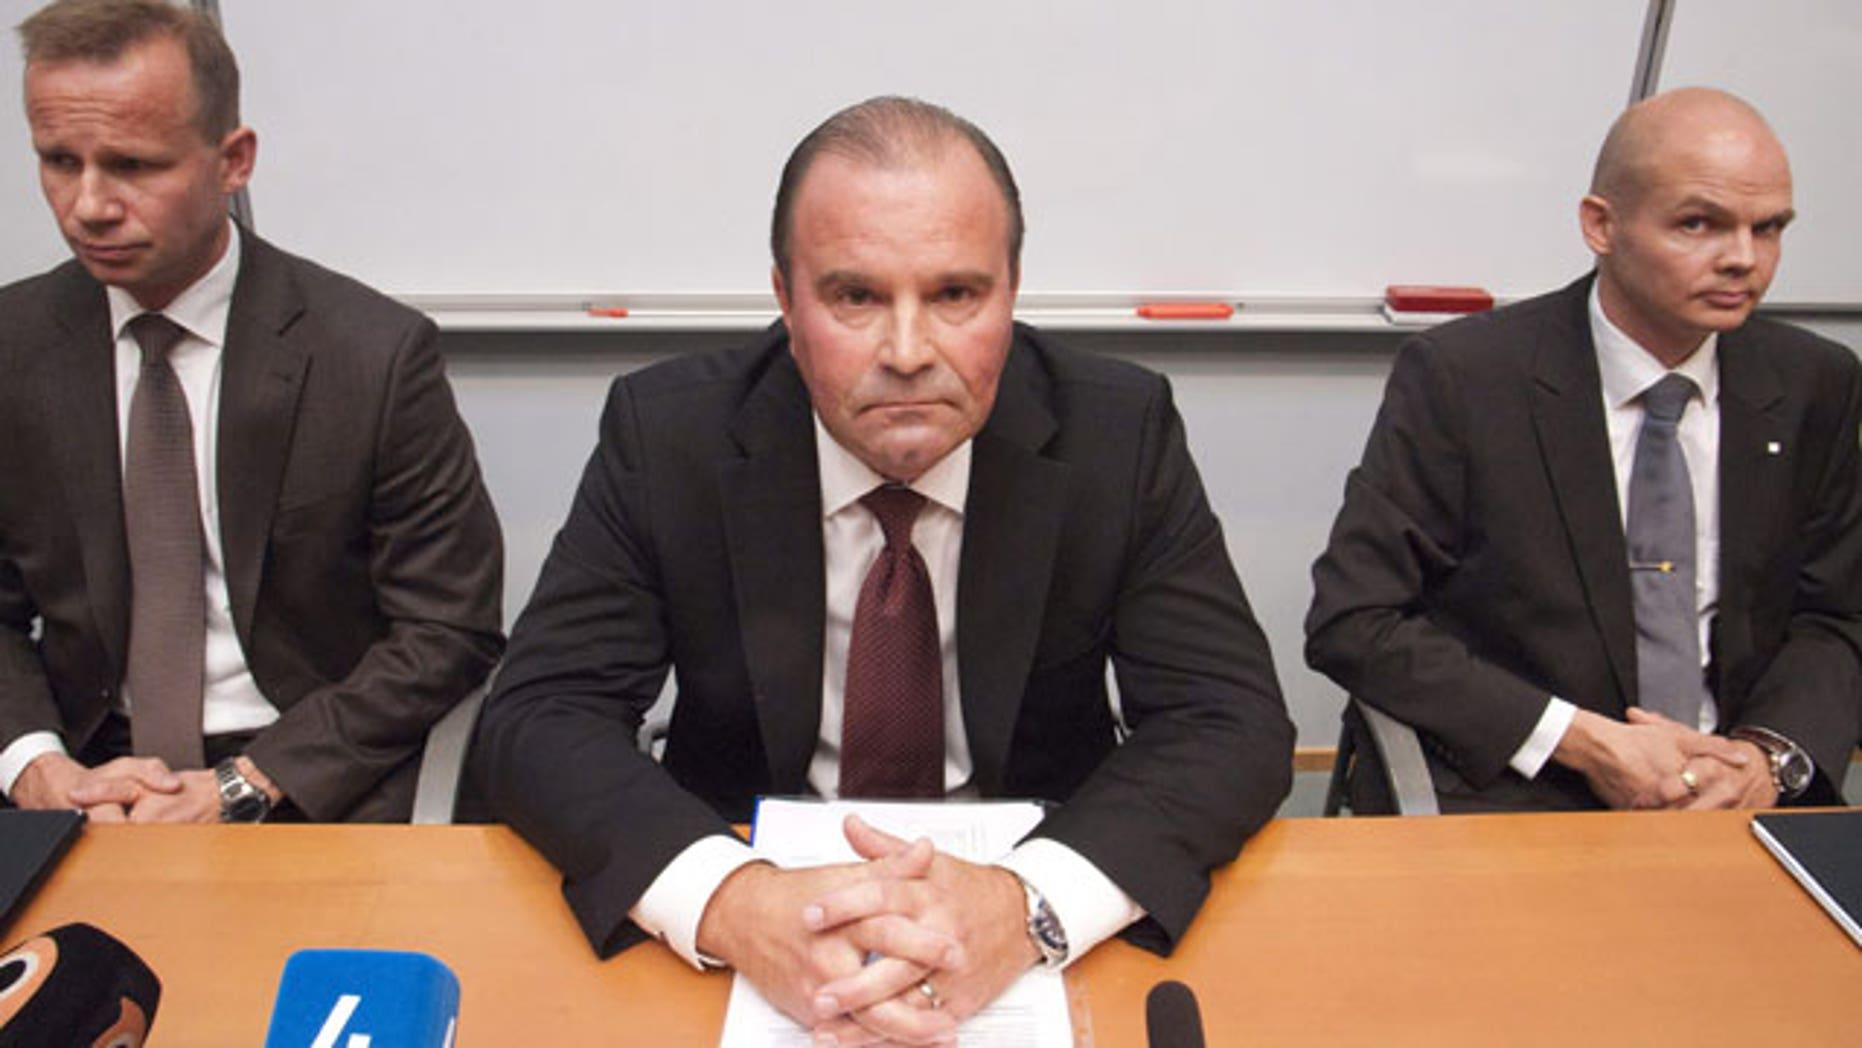 Finland's Detective Inspector Kaj-Erik Bjorkvist from the National Bureau of Investigation.